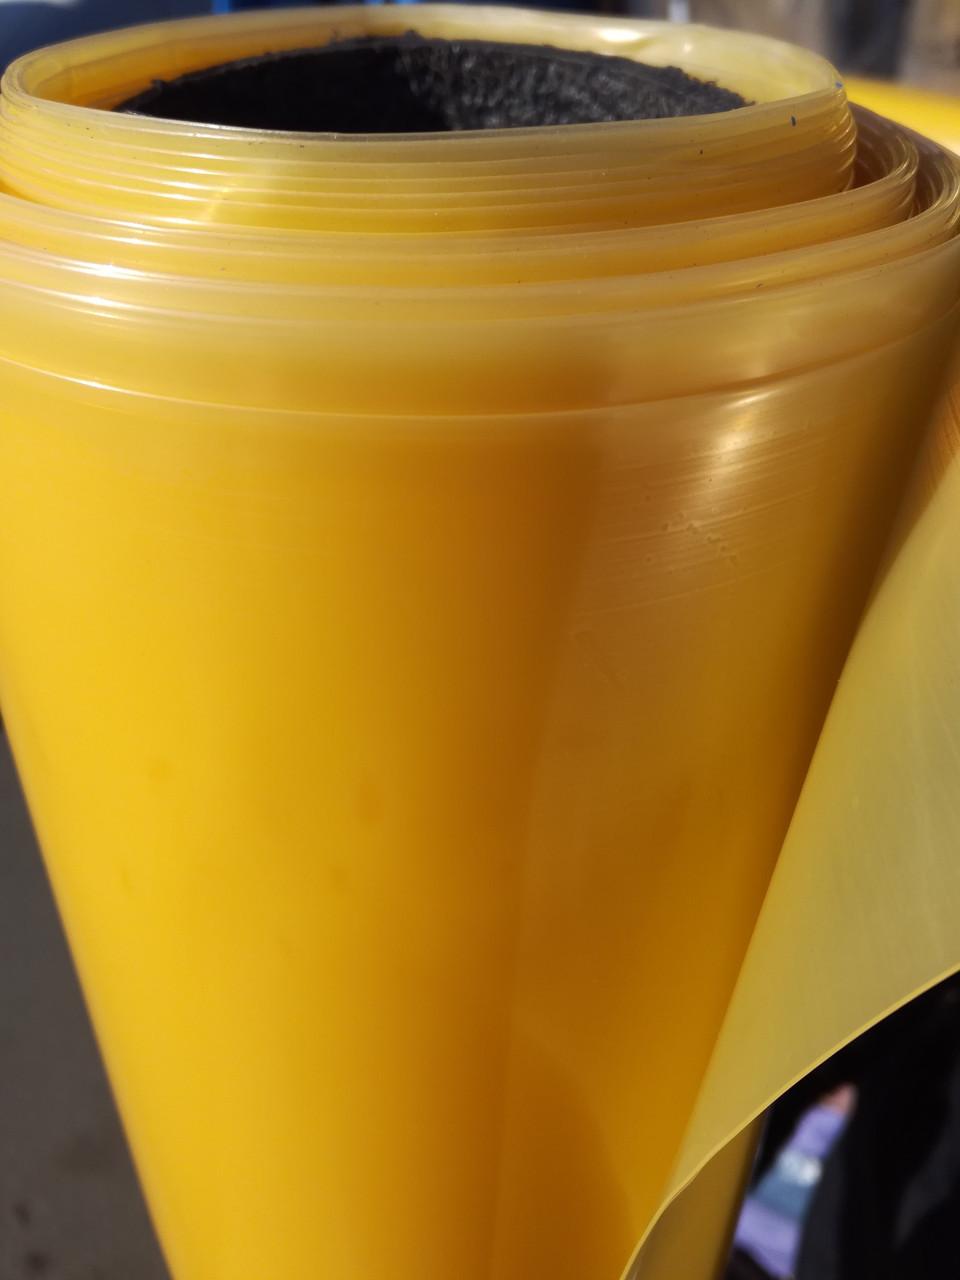 Пленка тепличная стабилизация 24мес. толщина 120 мкм, размер 10мх50м, вес 53 кг